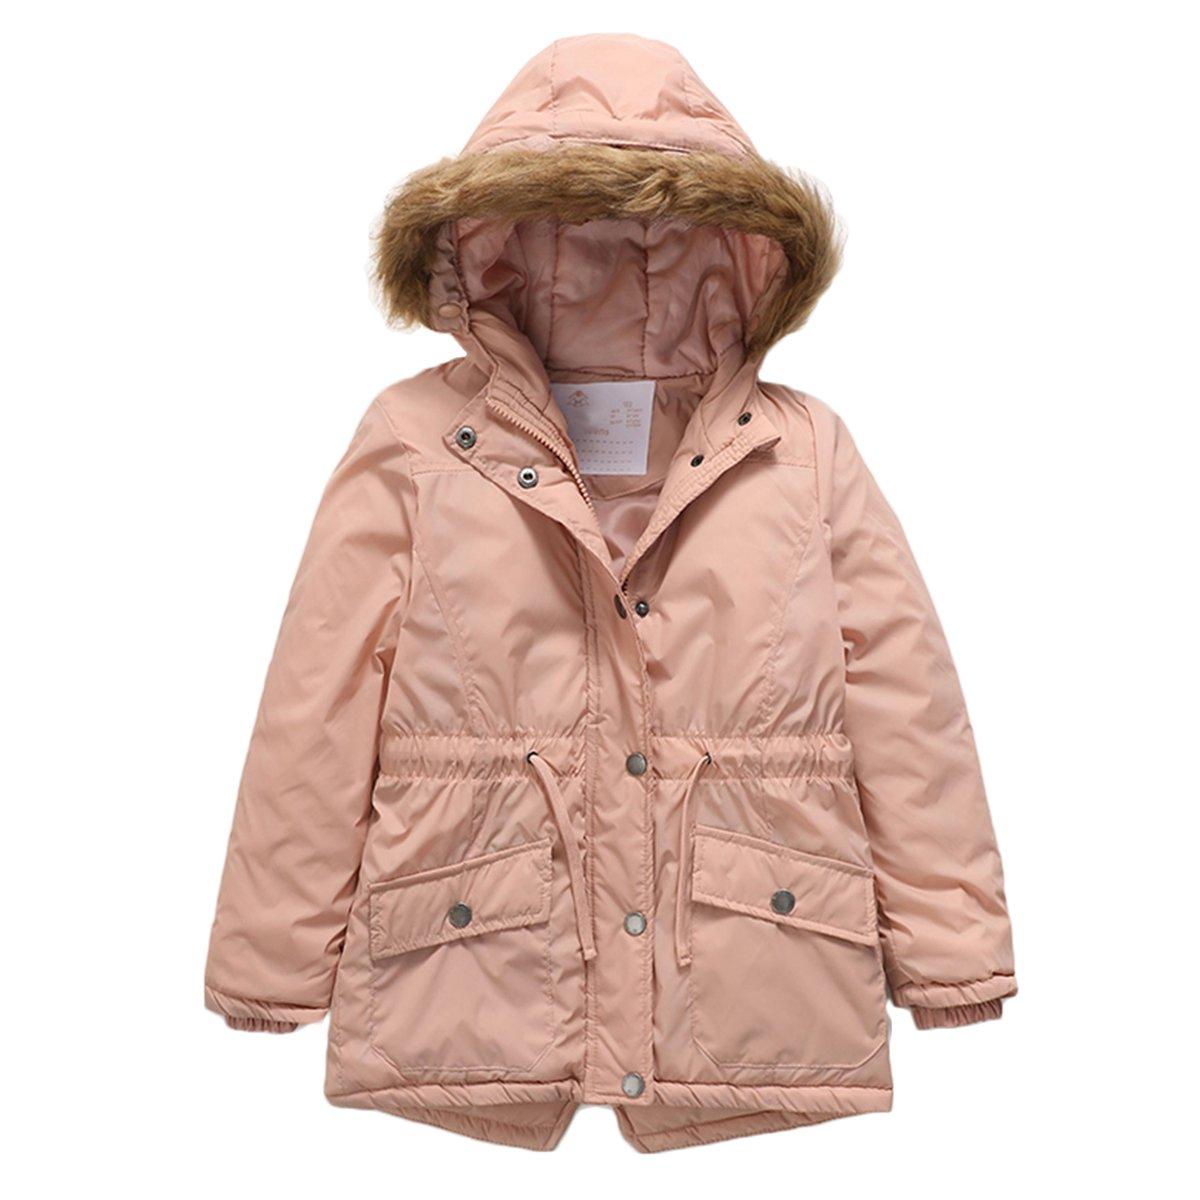 PHIBEE Girls' Cotton Winter Windproof Faux Fur Hooded Parka Jacket Pink 6